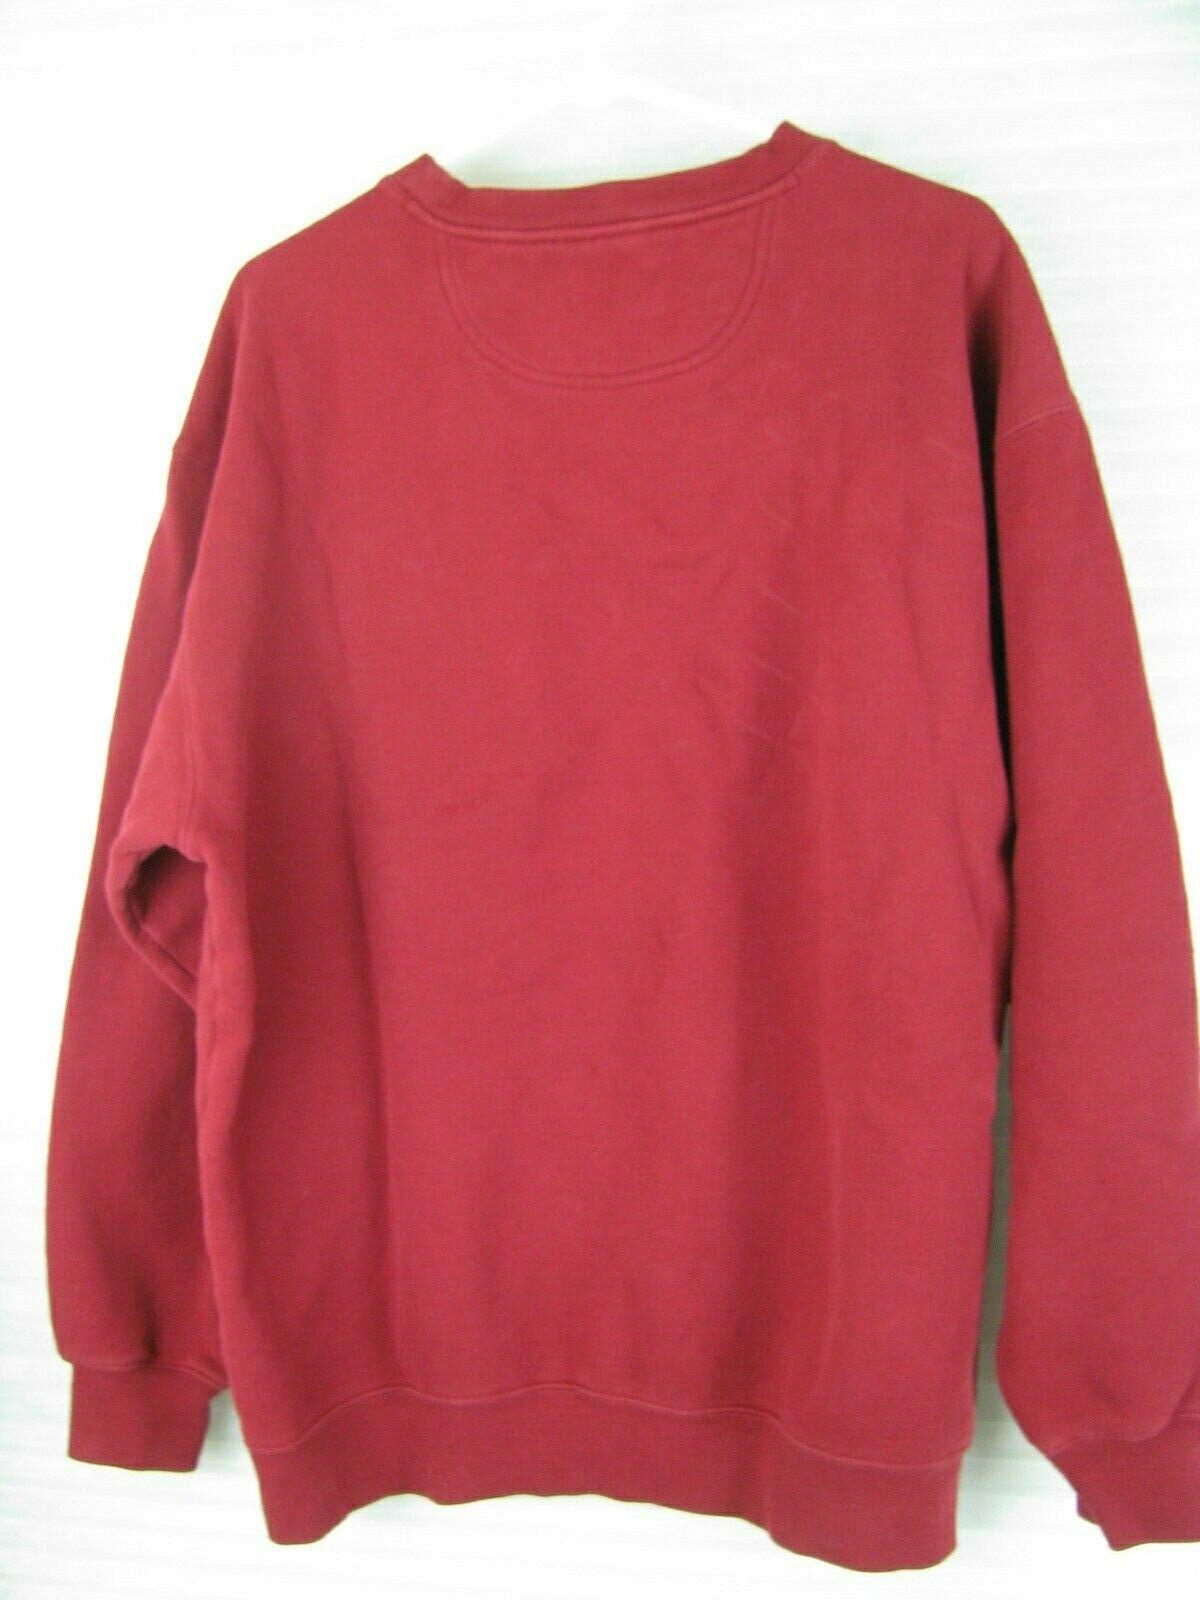 Lee Sueded Dallas Rancho Zabaco Winery Crush Mens Red Crewneck Sweatshirt Large image 4